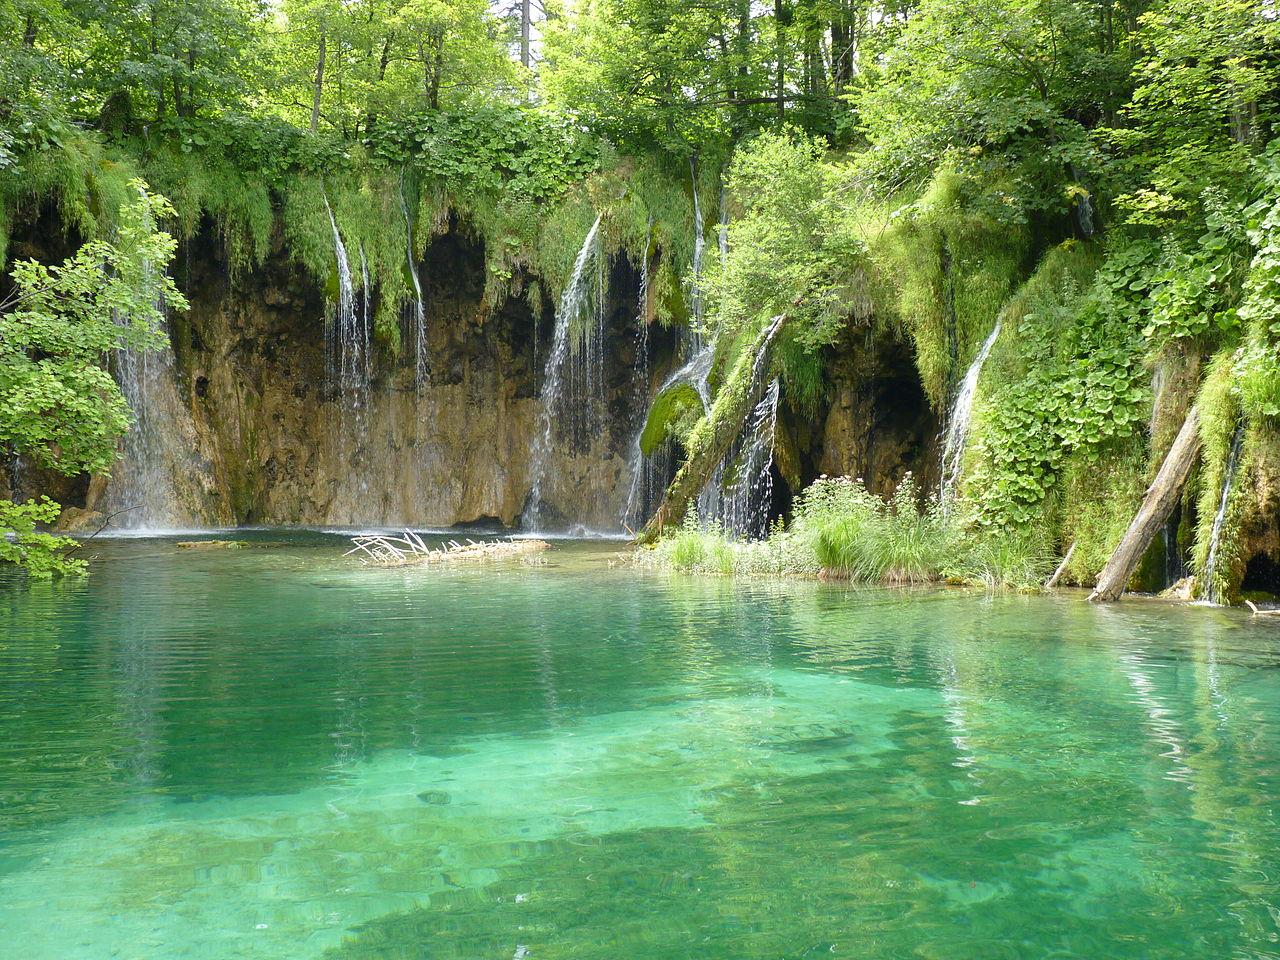 Scenery Wallpaper Hd Free Download File Plitvice Lakes Croatia Summer 2011 17 Jpg